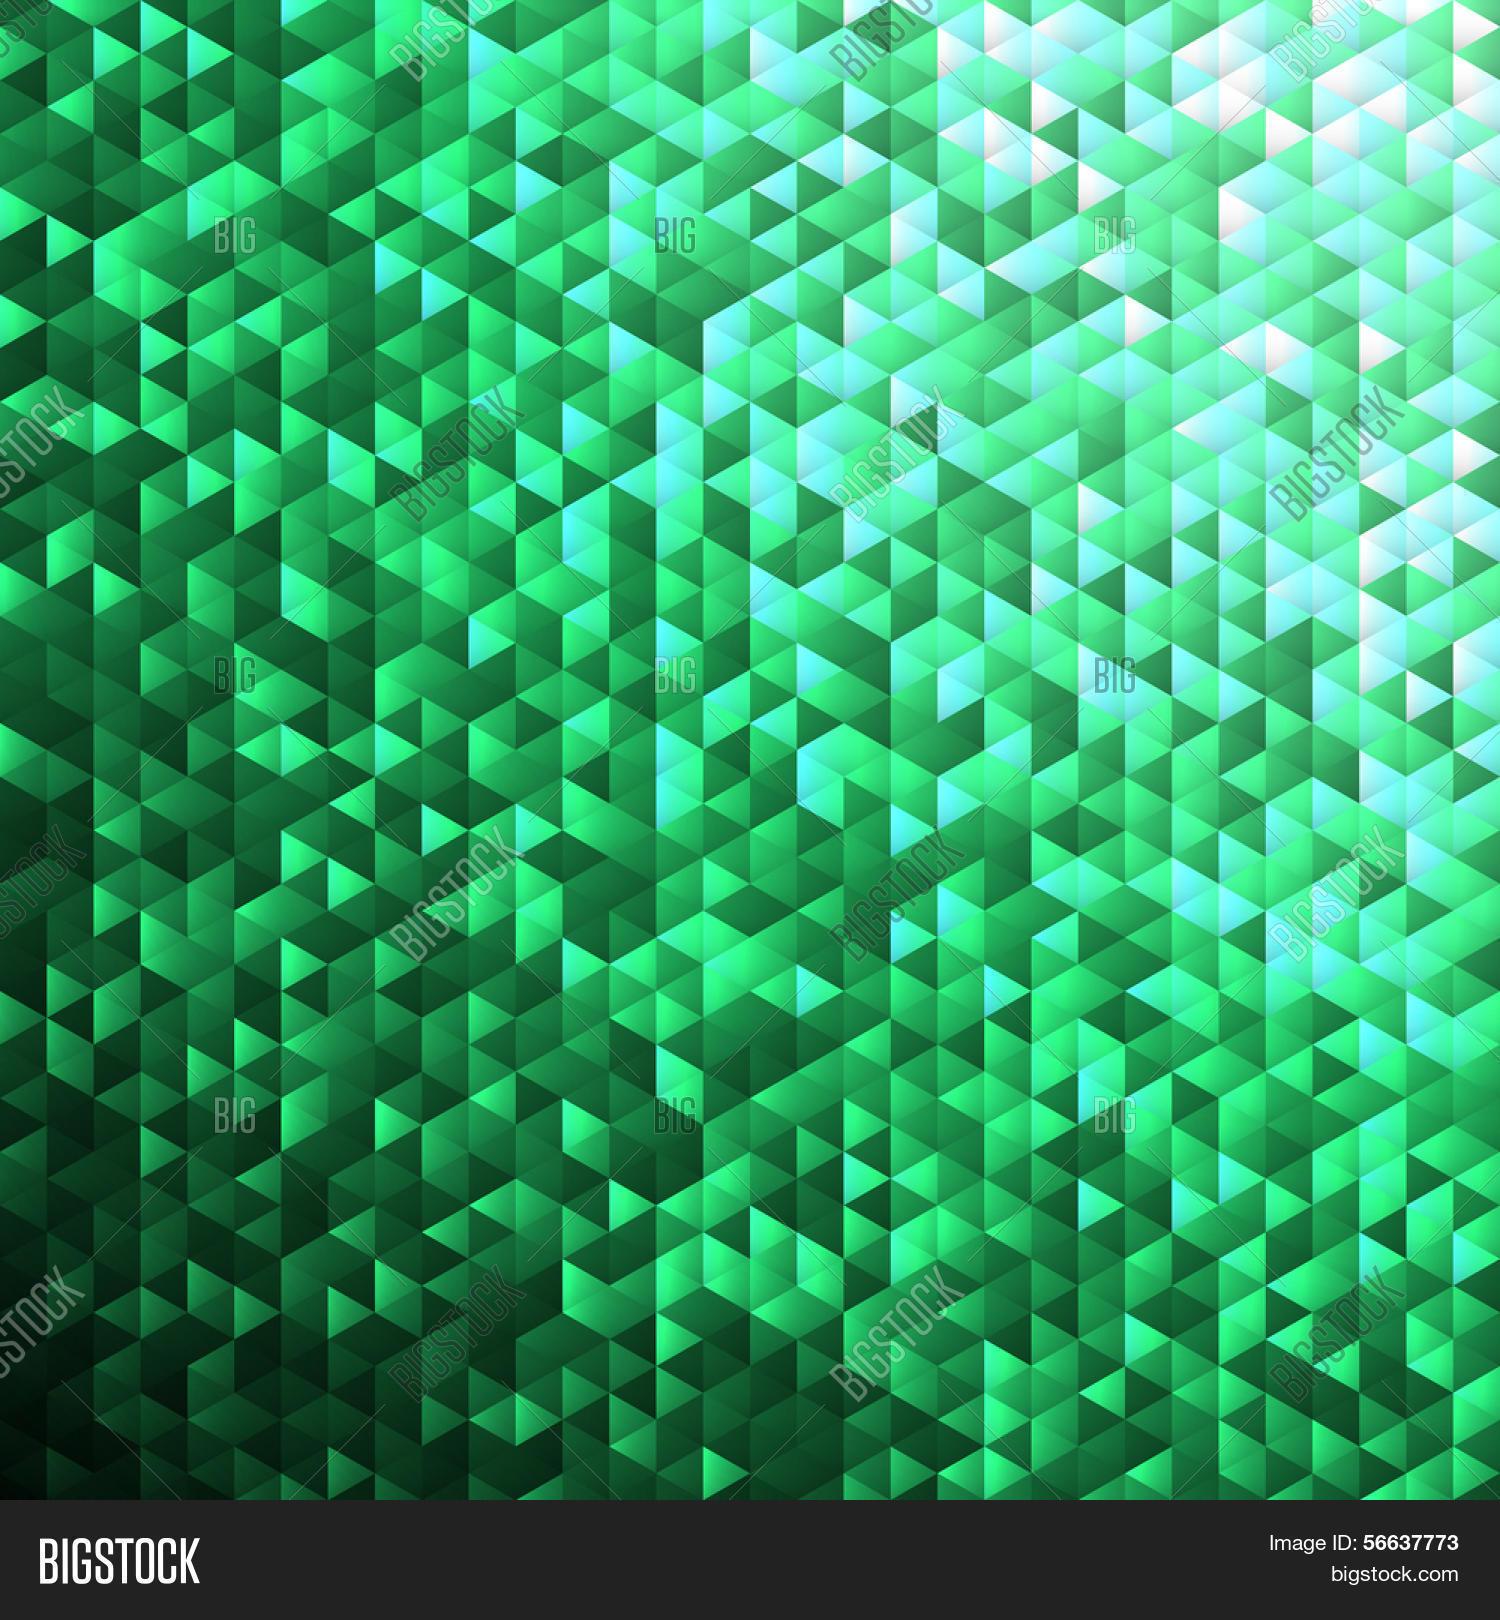 Emerald Green Vector Photo Trial Bigstock 1500x1620